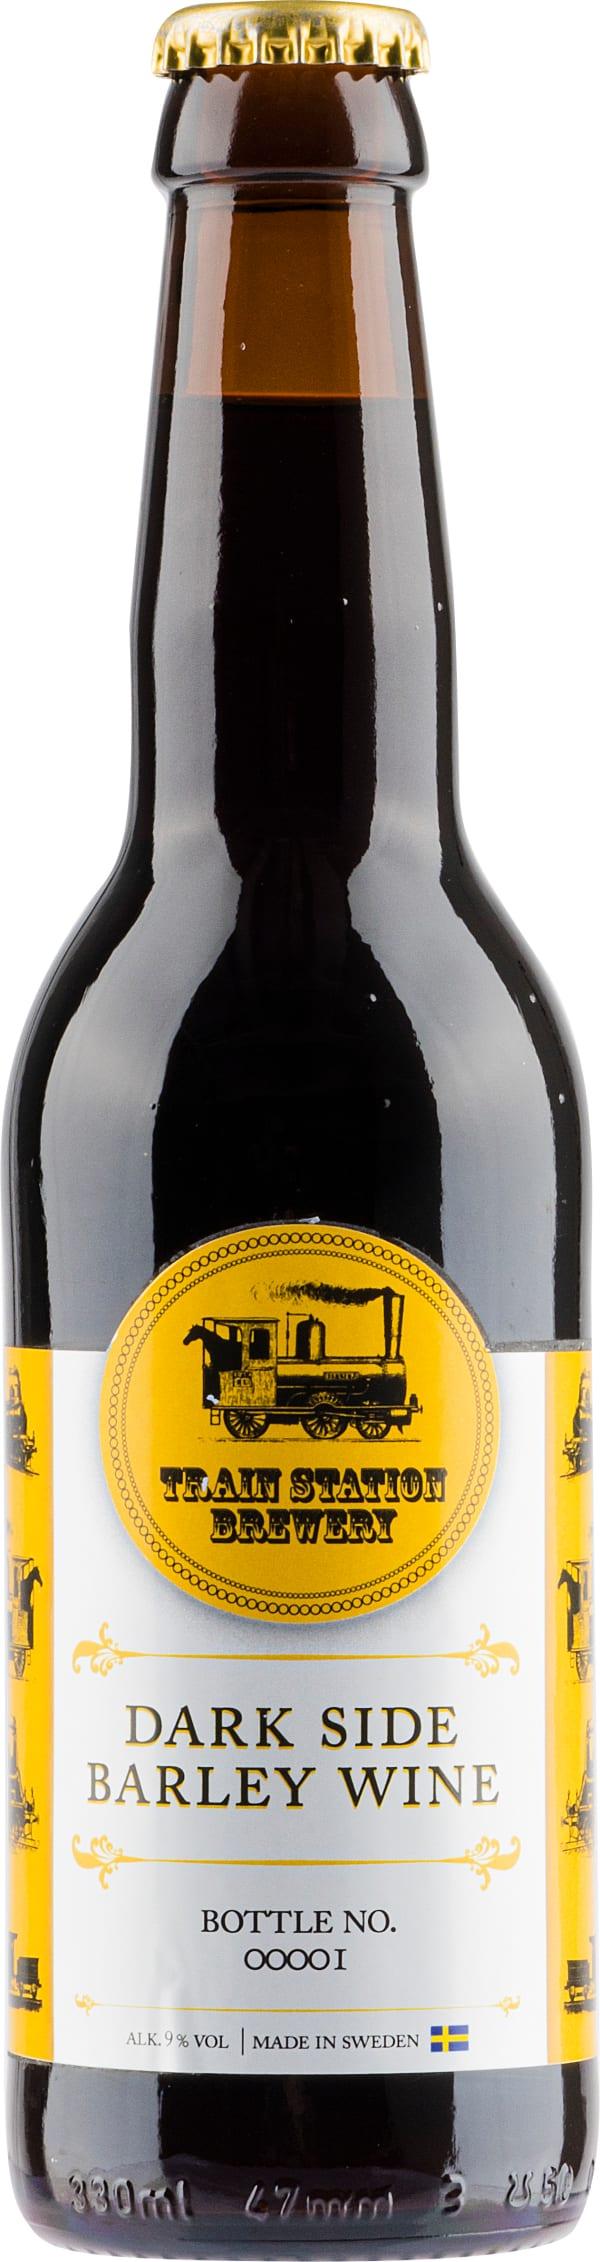 Train Station Dark Side Barley Wine